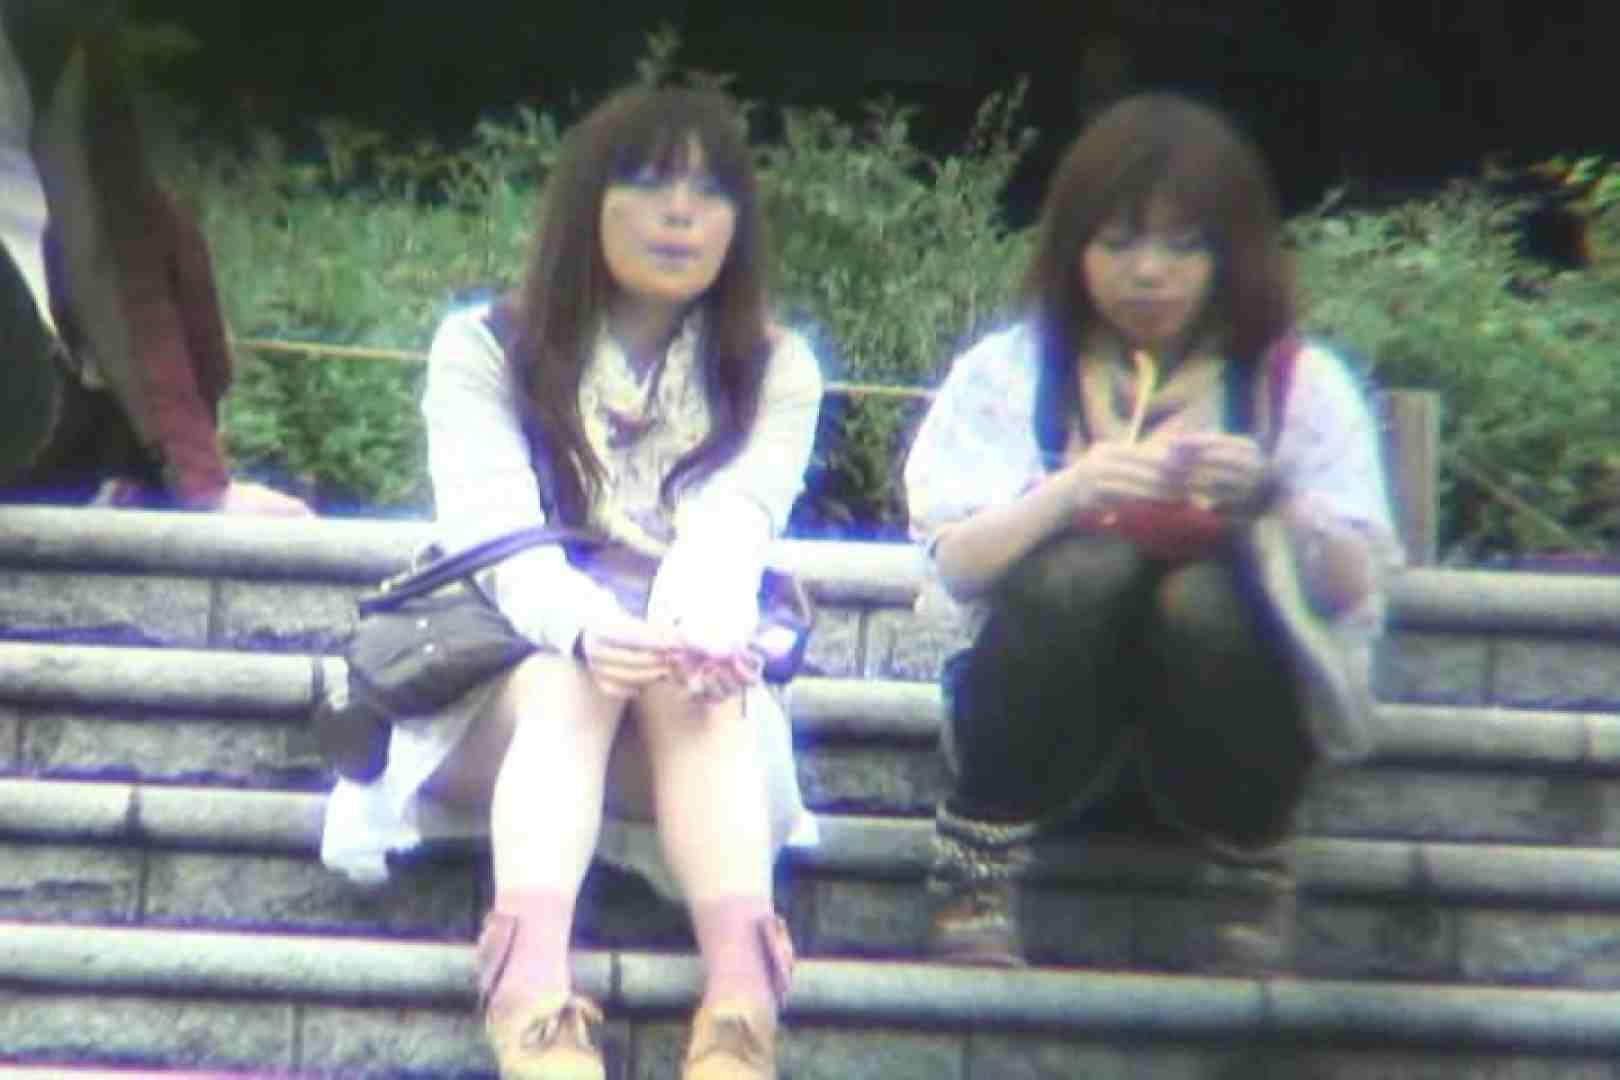 超最新版!春夏秋冬 vol.04 ギャル SEX無修正画像 98pic 95